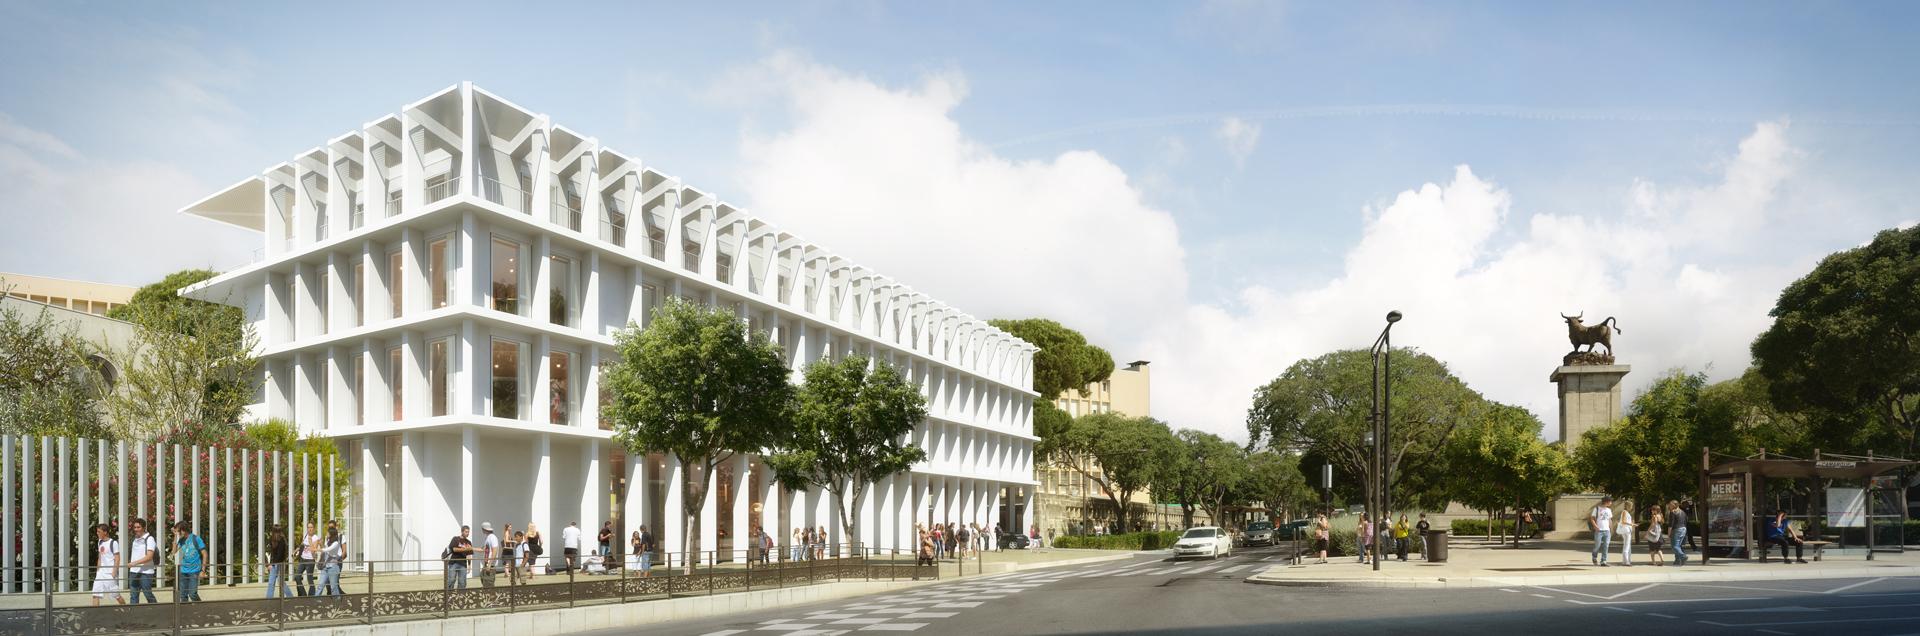 TRAVERSES Architectes-Lycee Hemingway Nimes-Perspective de concours